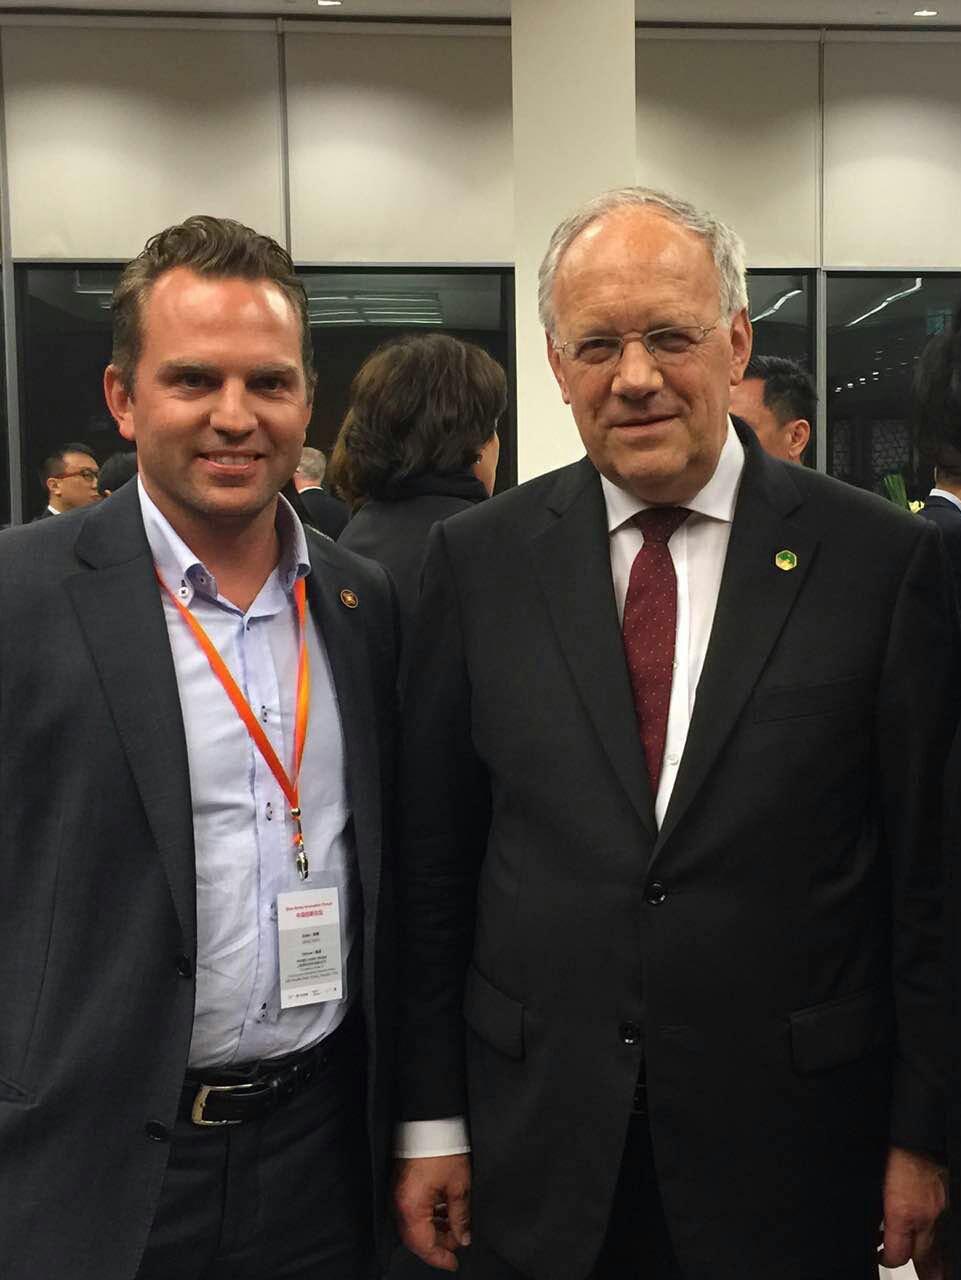 Viktor Meier, cofundador de Glice® junto al presidente de Suiza Schneider-Ammann